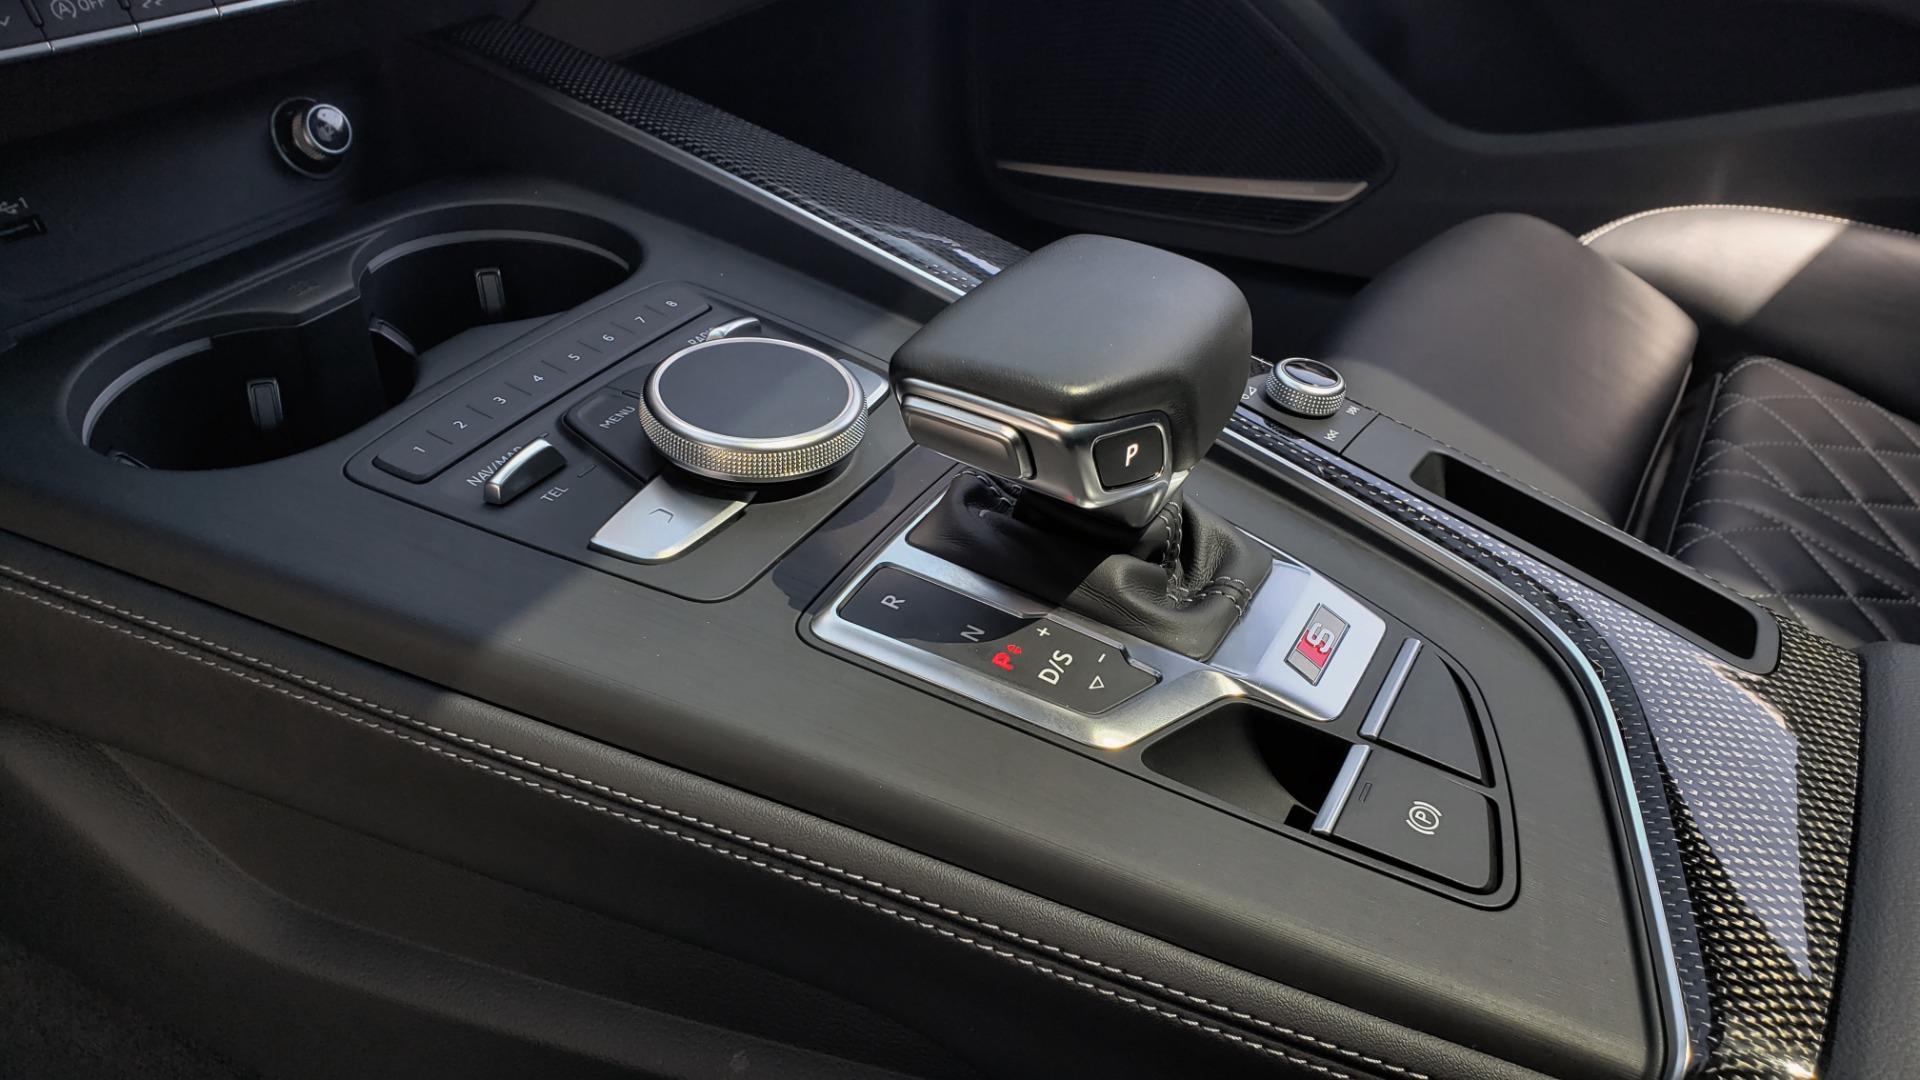 Used 2018 Audi S5 SPORTBACK PRESTIGE S-SPORT / NAV / SUNROOF / HUD / B&O SND / REARVIEW for sale $48,995 at Formula Imports in Charlotte NC 28227 49